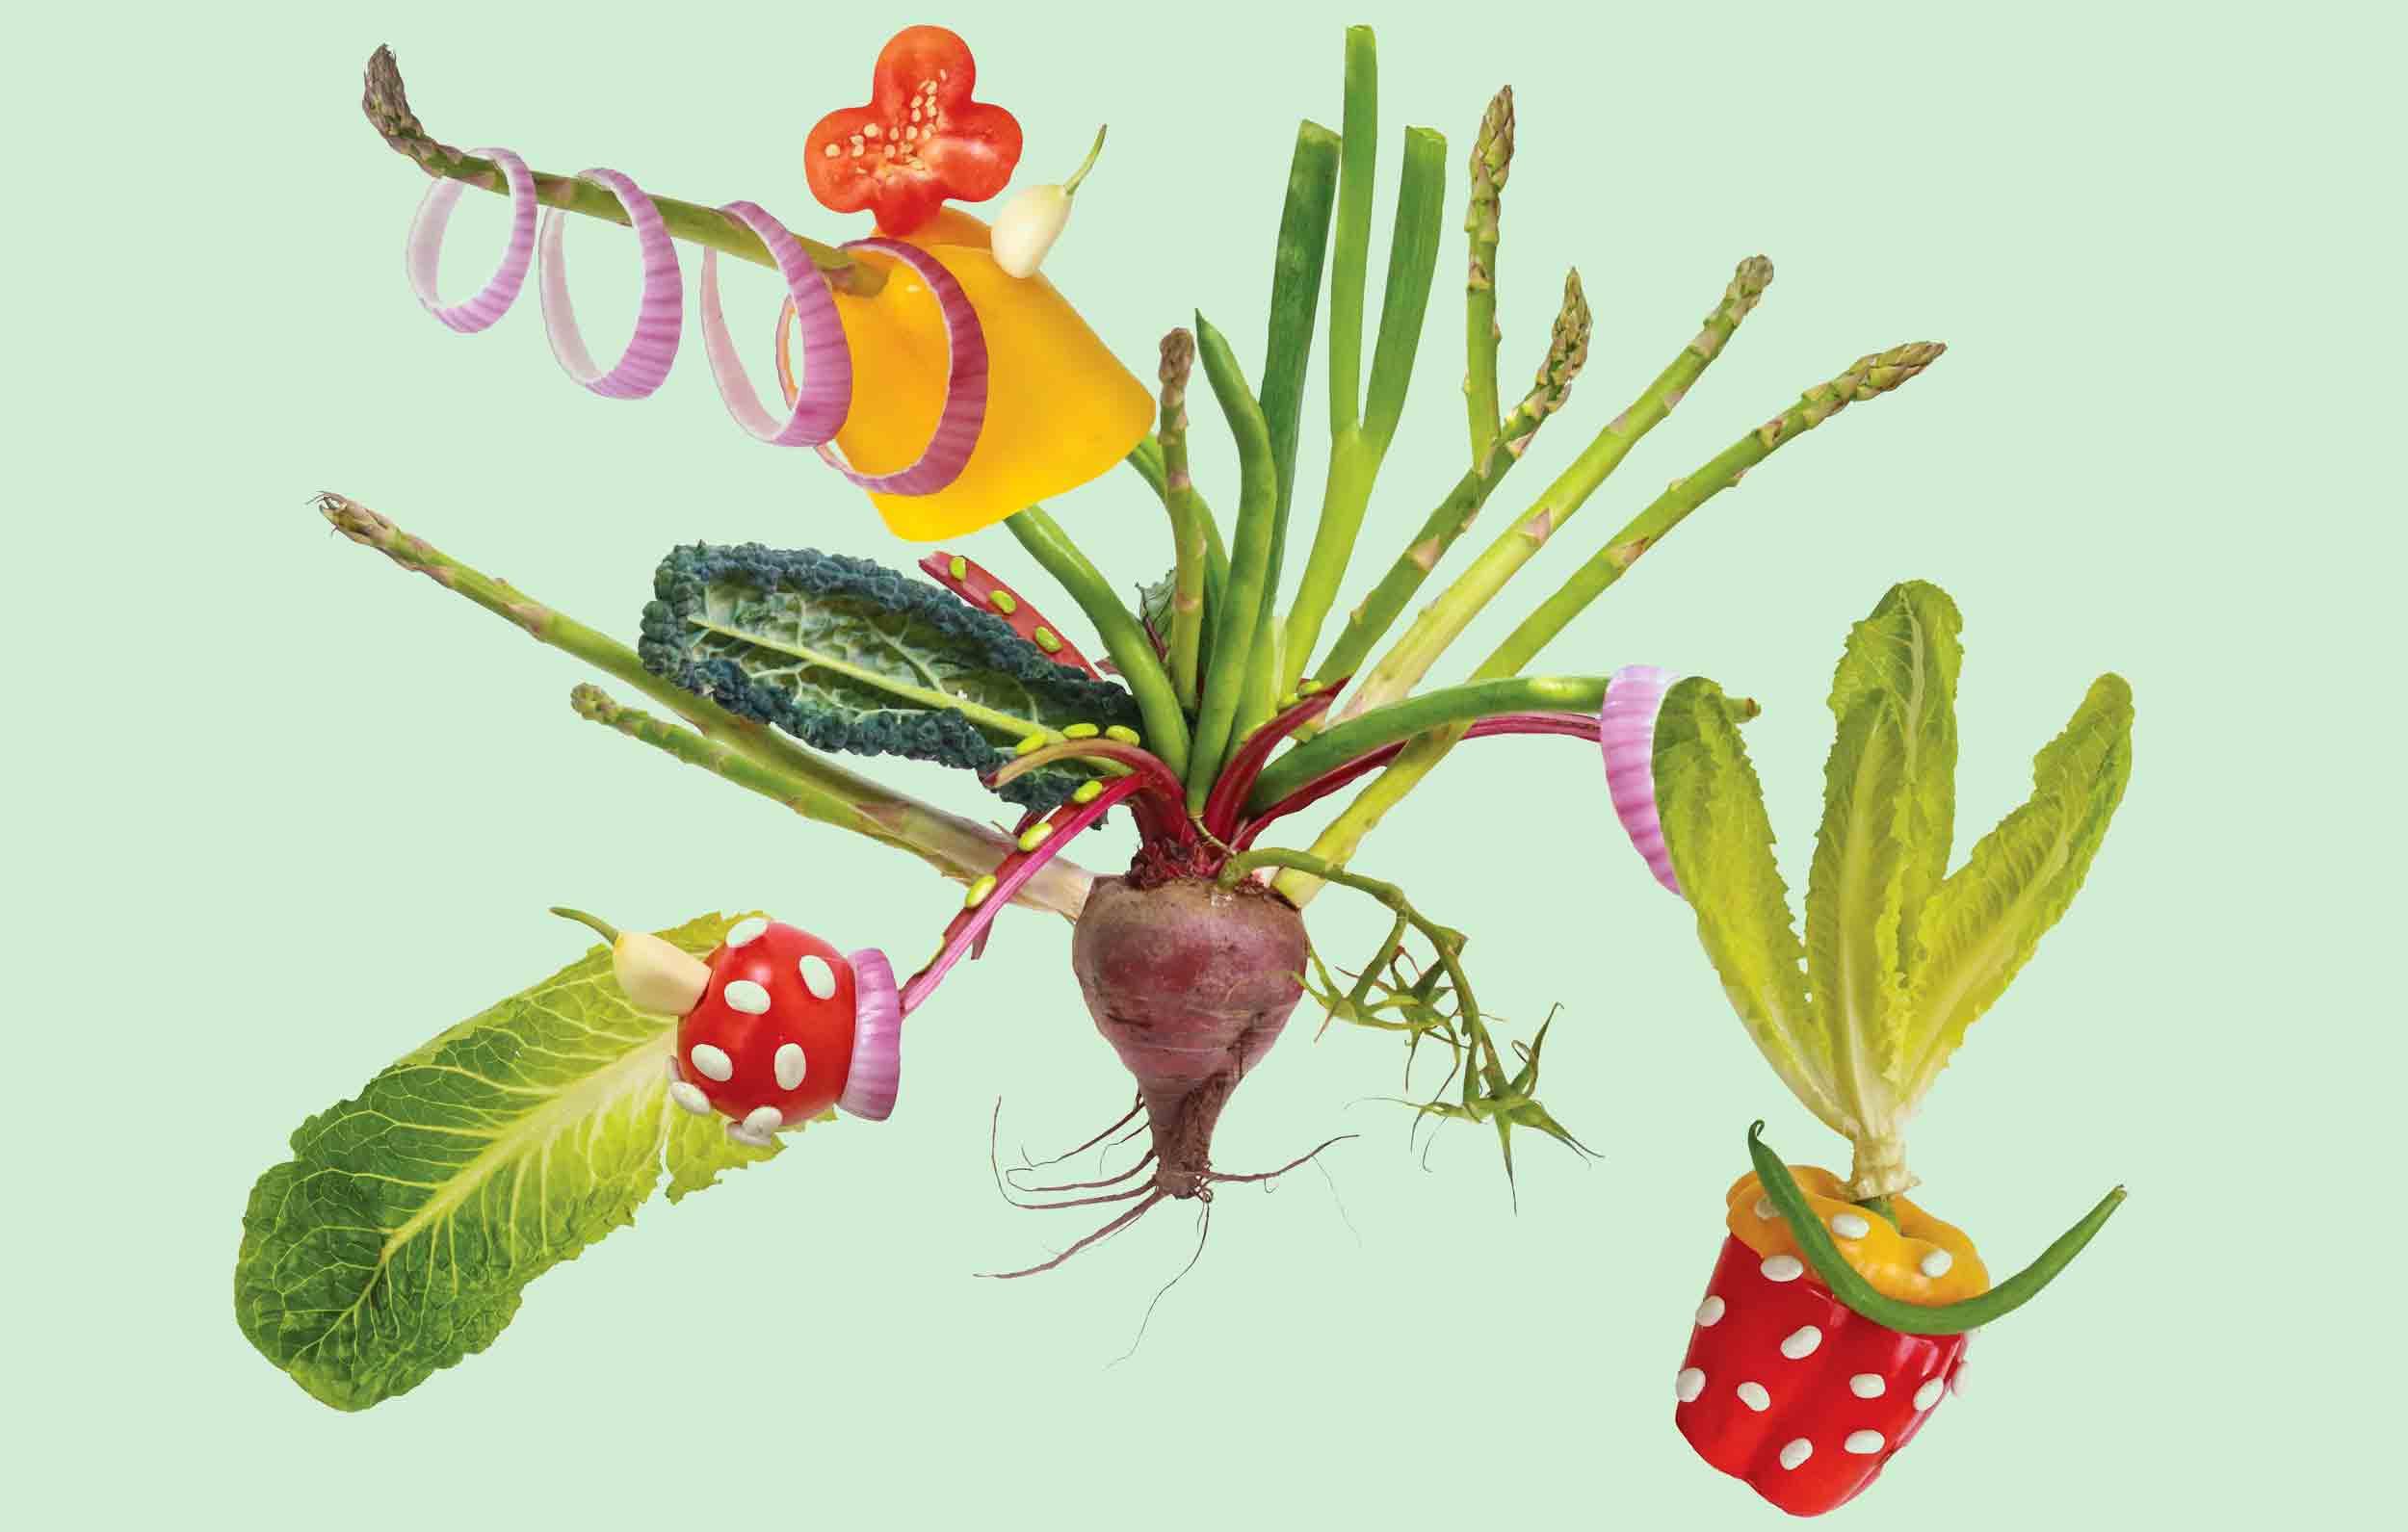 barneys-elise-mesner-salad-2500px.jpg